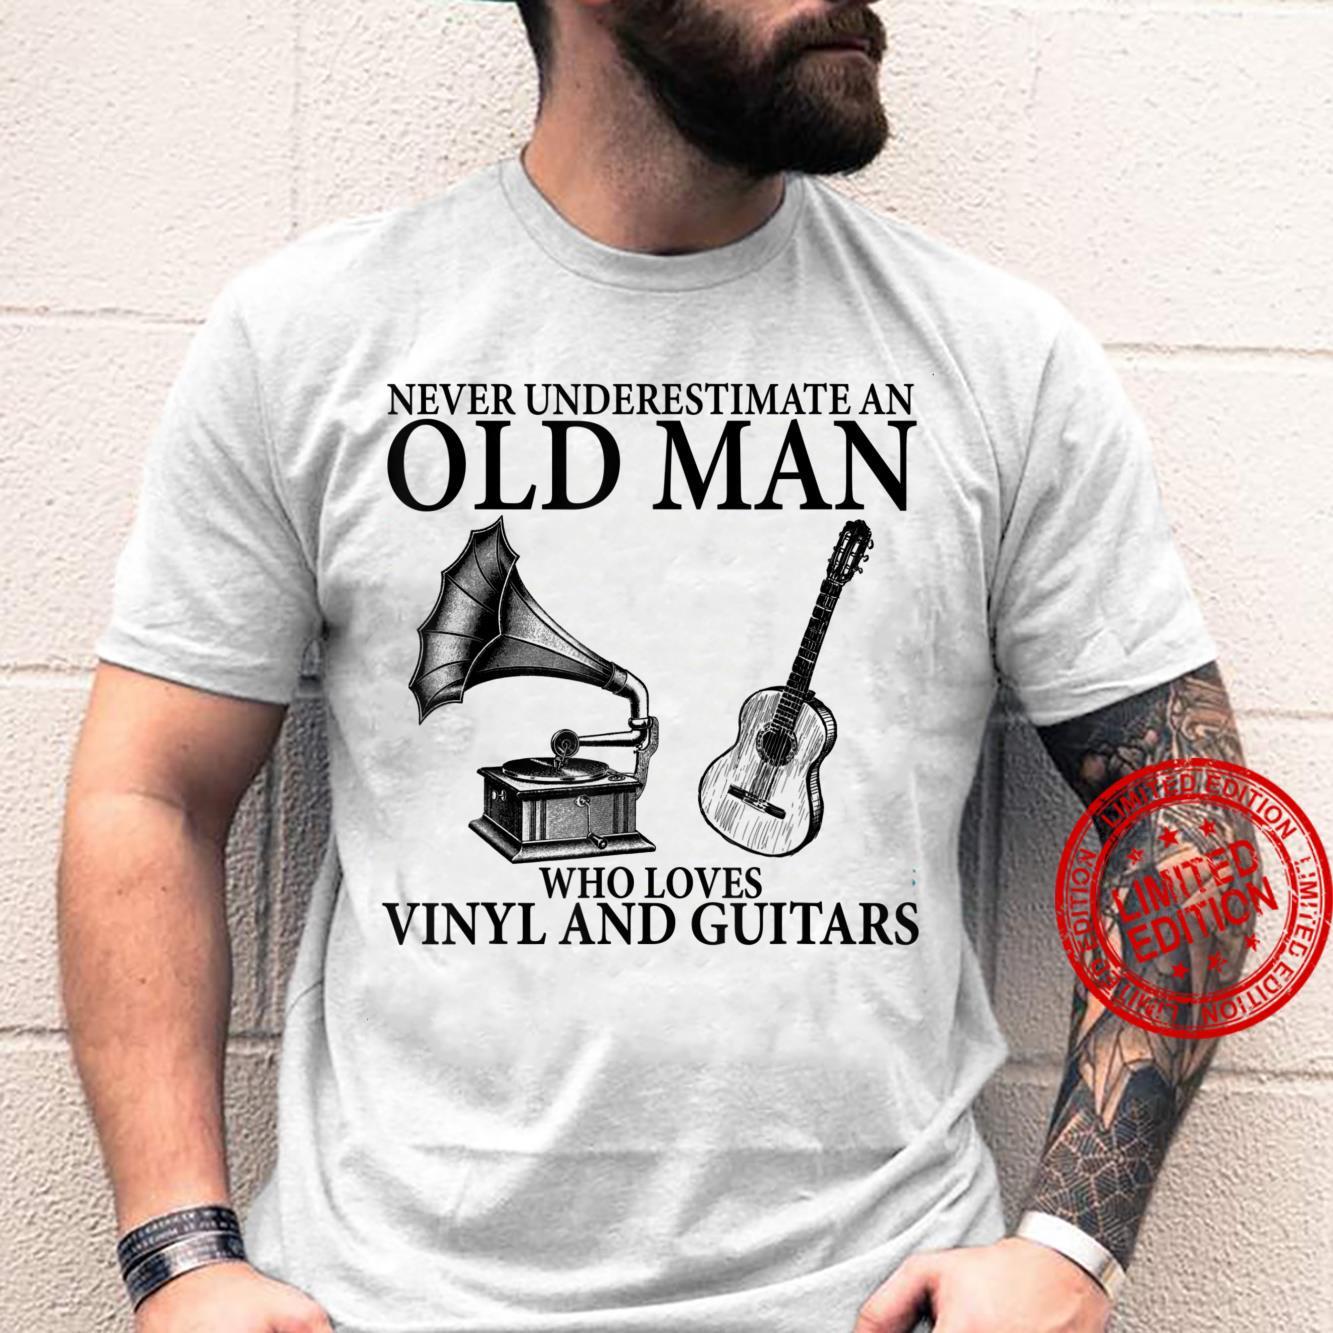 Old man Vinyl records & Guitar Apparel Shirt